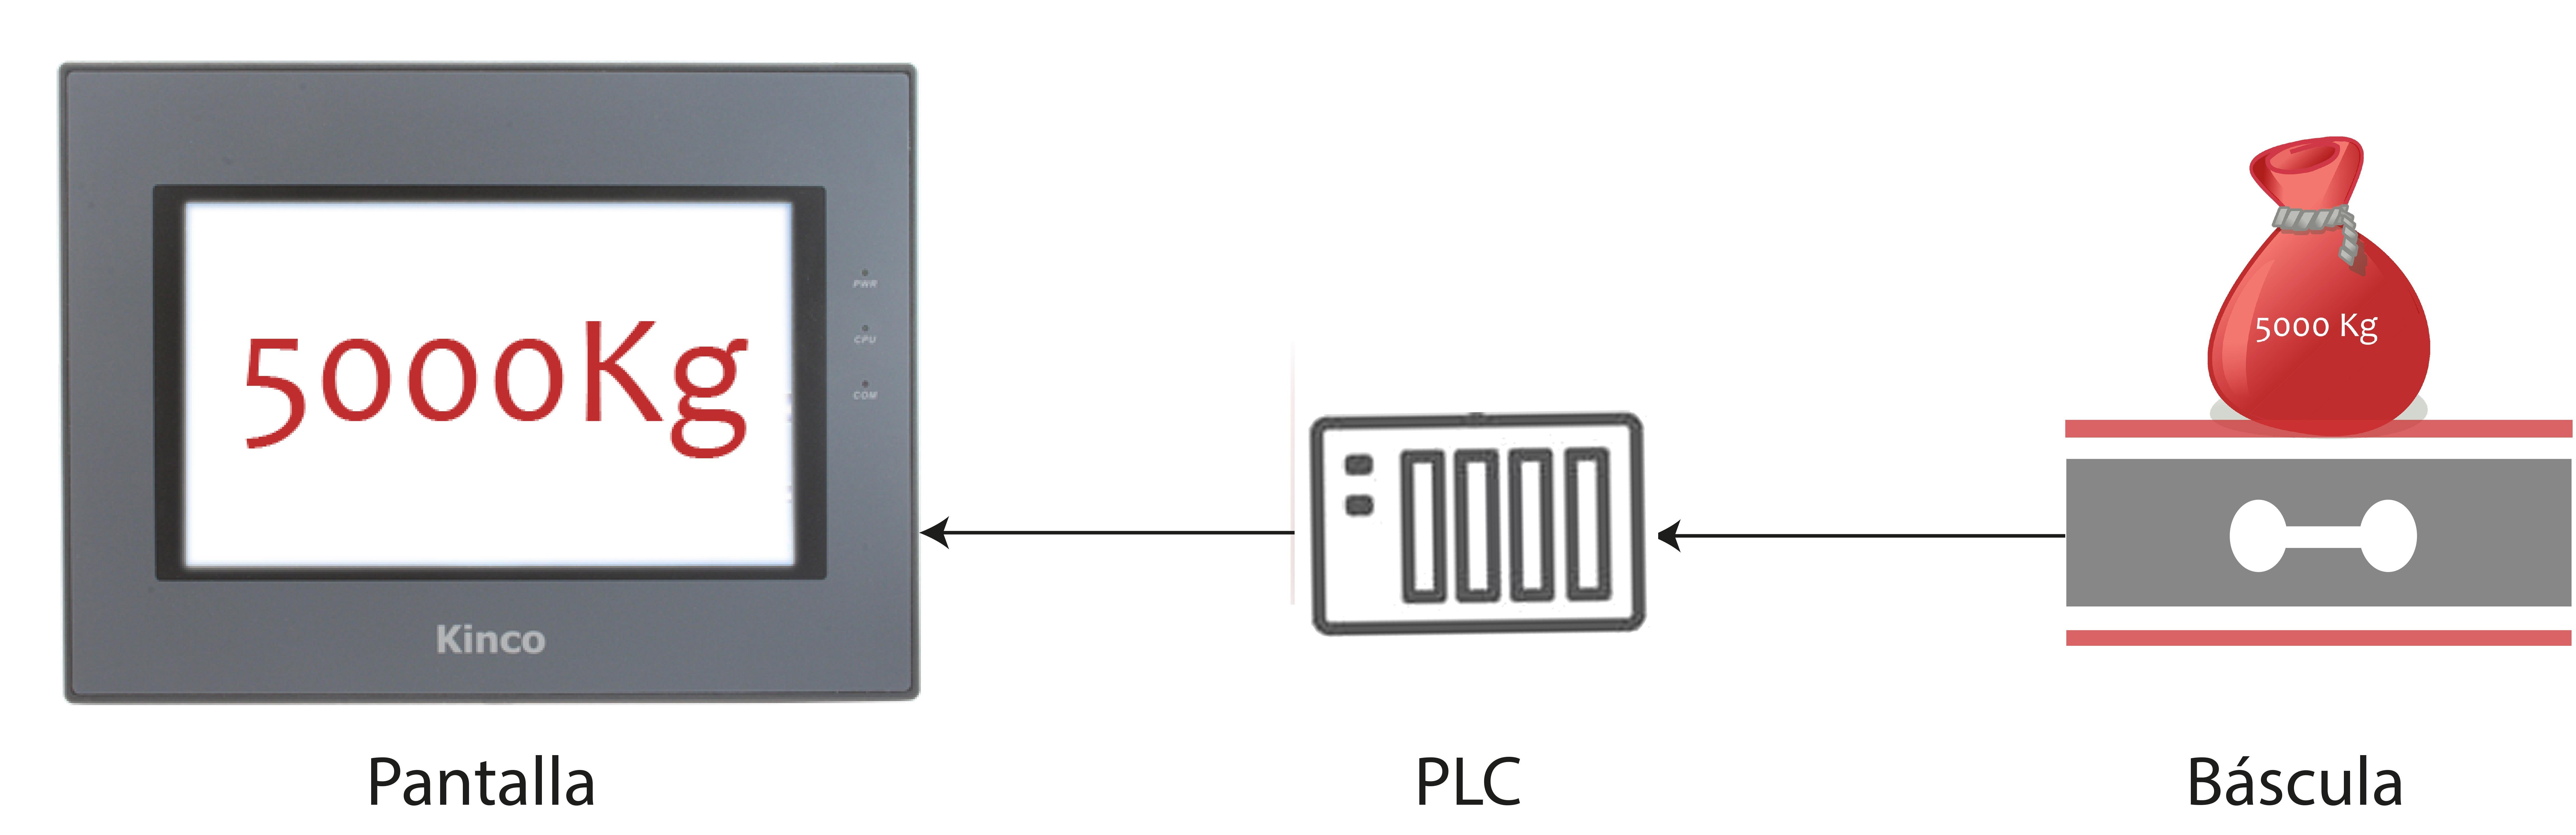 aplicacion-plc-bascula